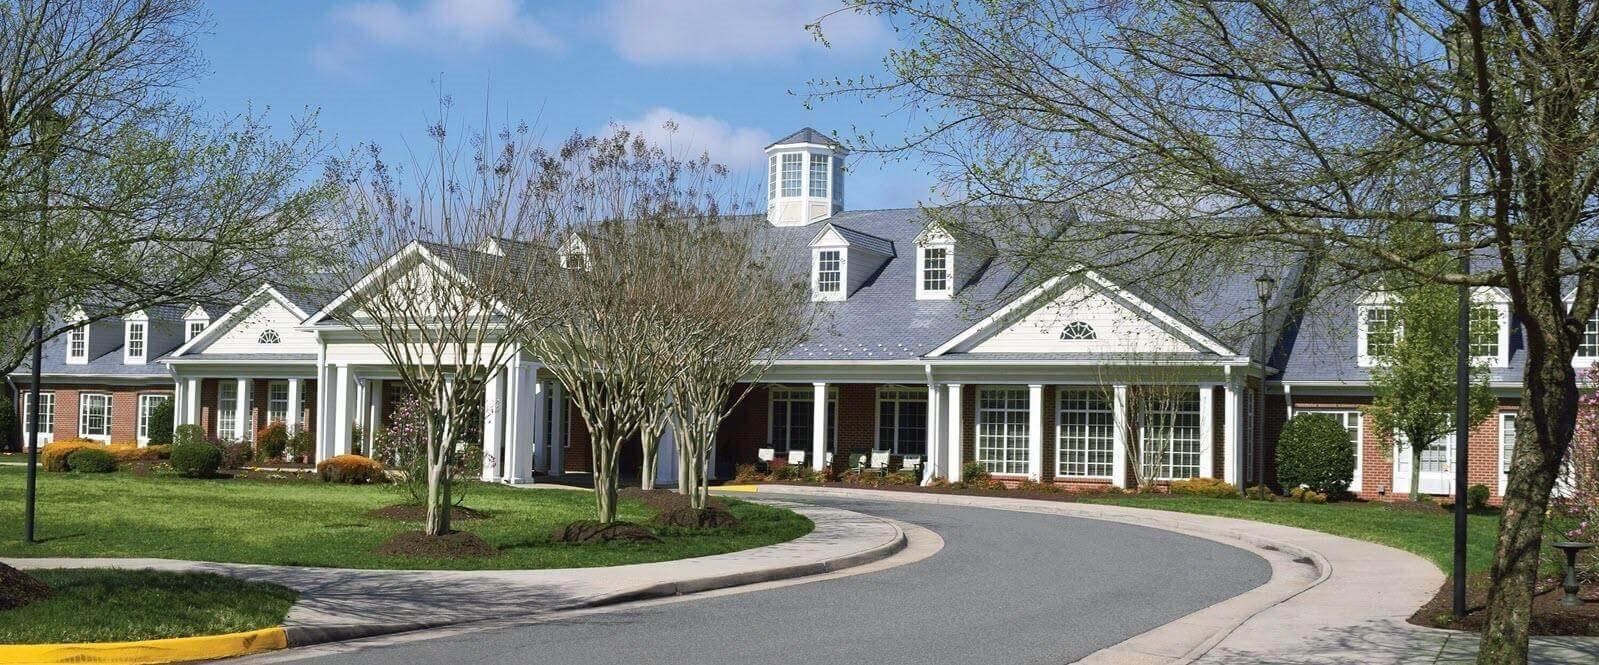 Elegant Exterior View Of Property at Spring Arbor of Salisbury, Midlothian, VA, 23113